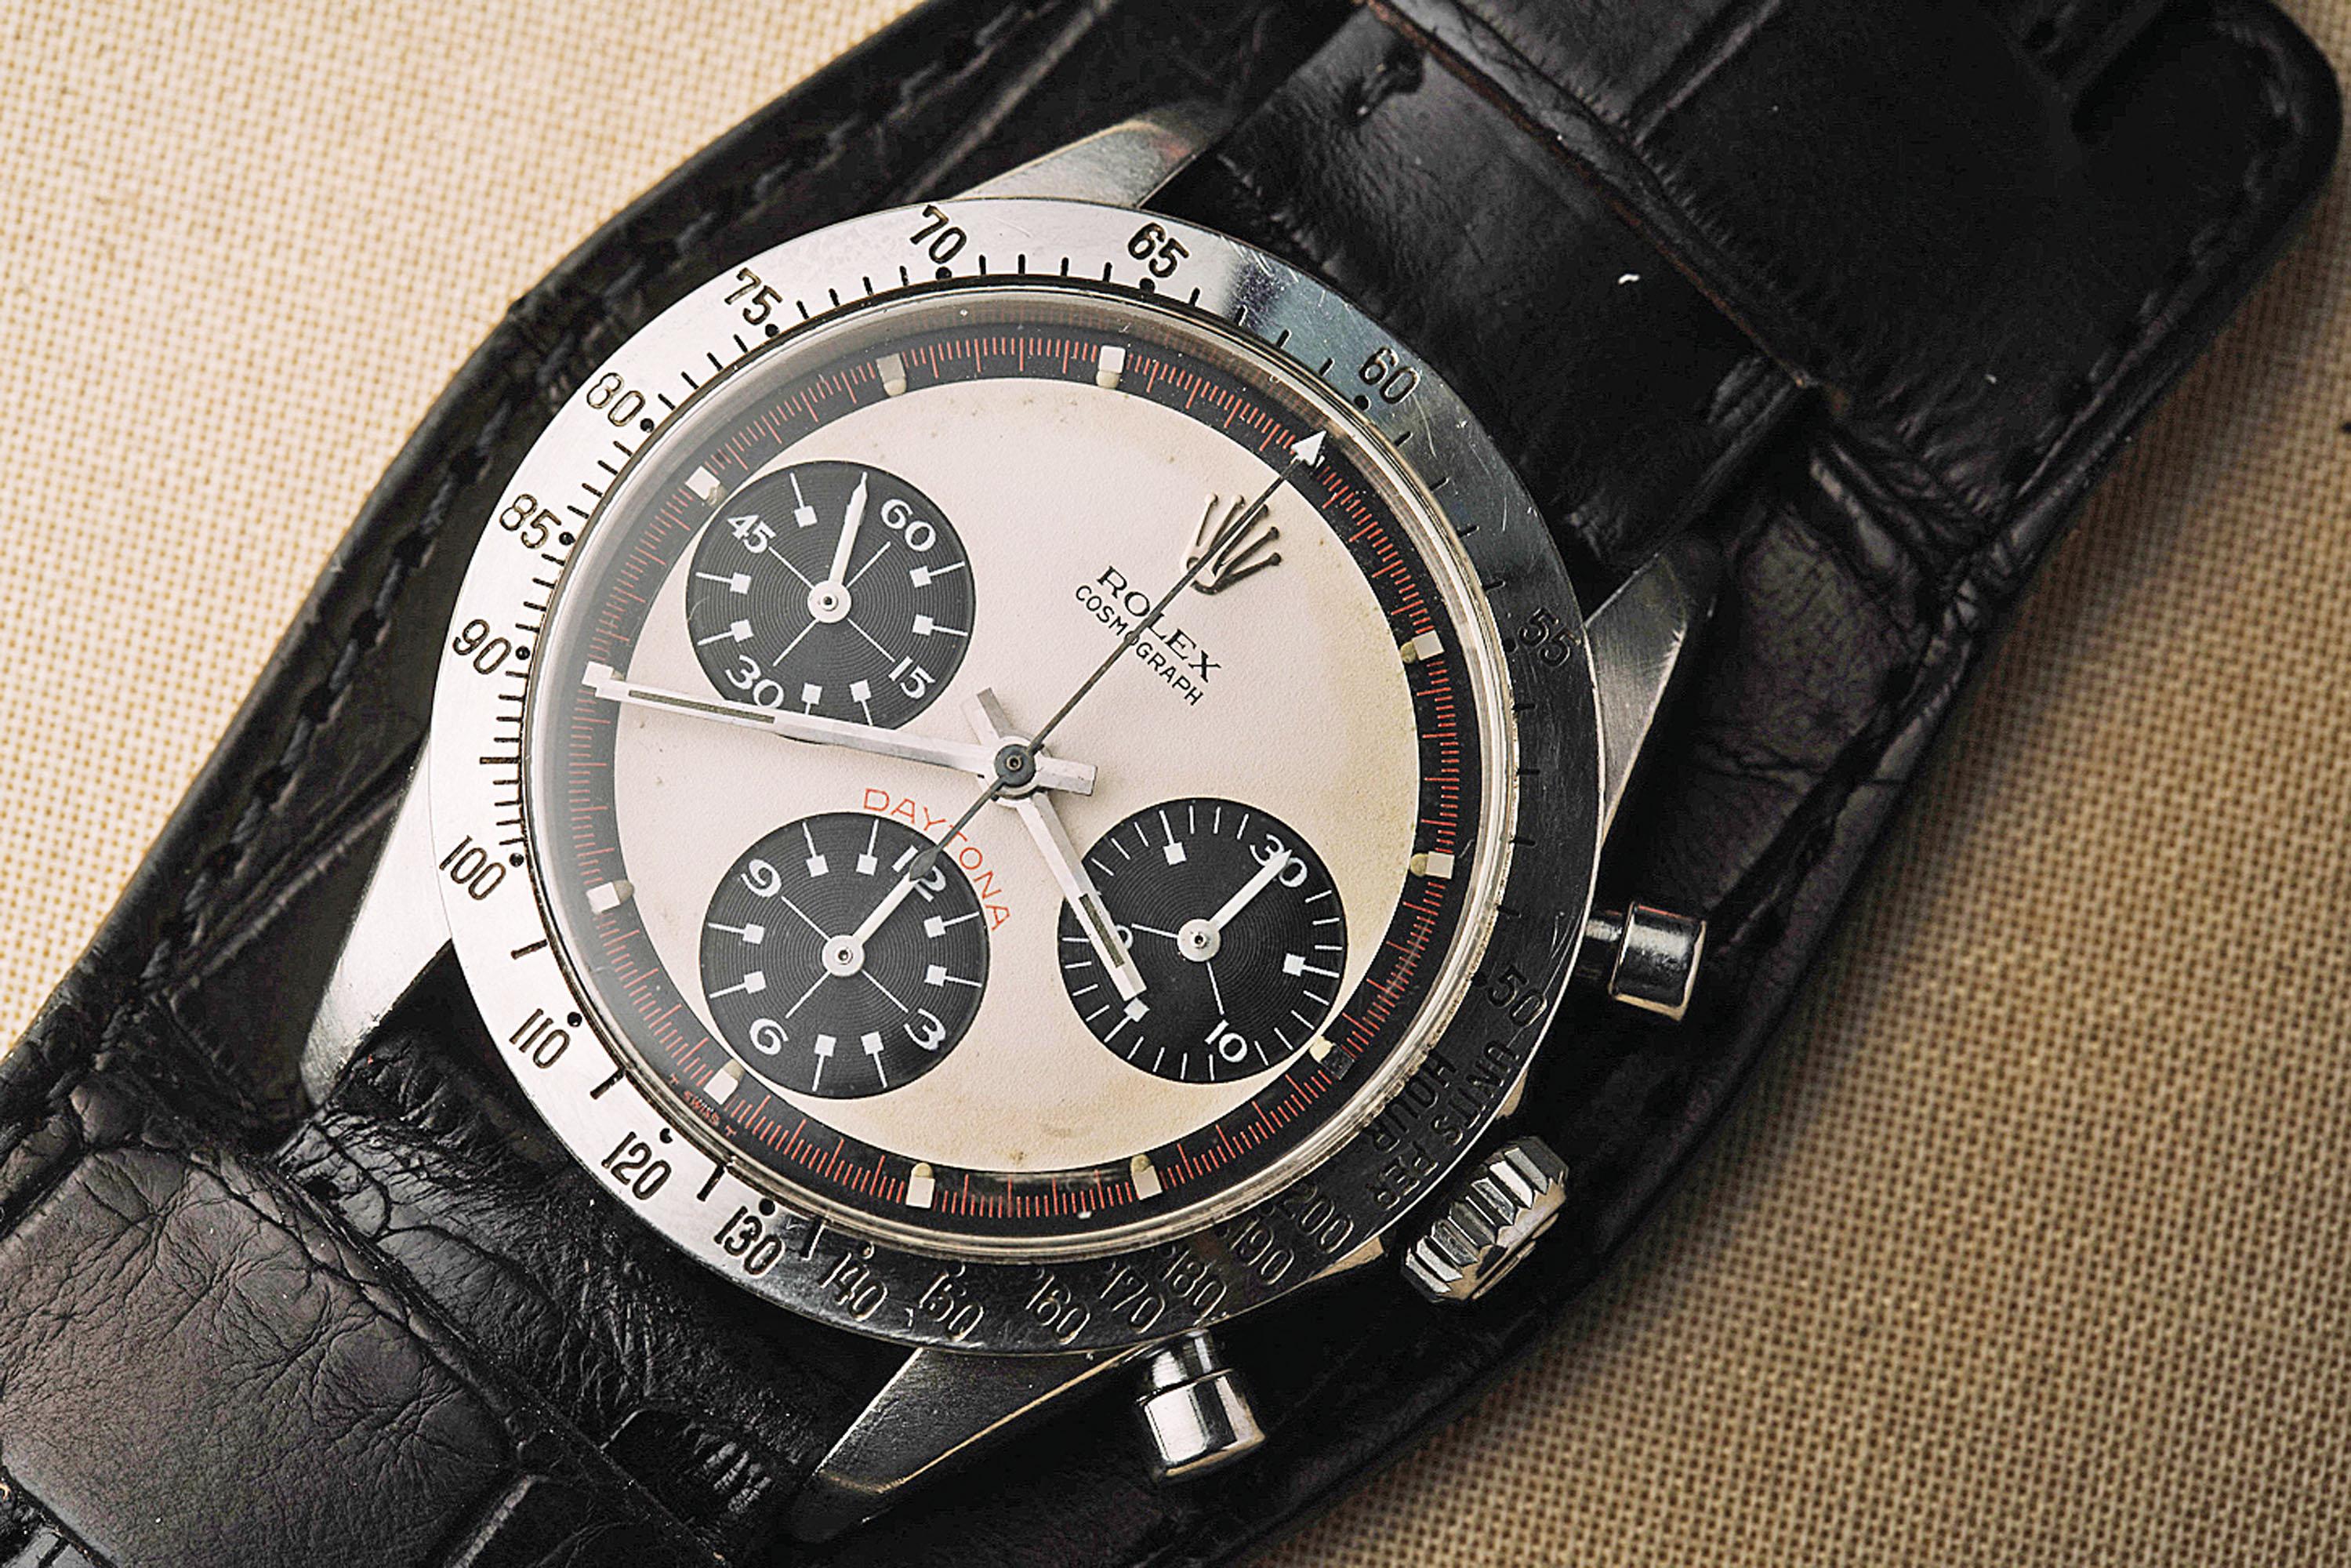 O Rolex Daytona de Paul Newman, lenda das telas e das pistas de corrida é o grande recordista de valor